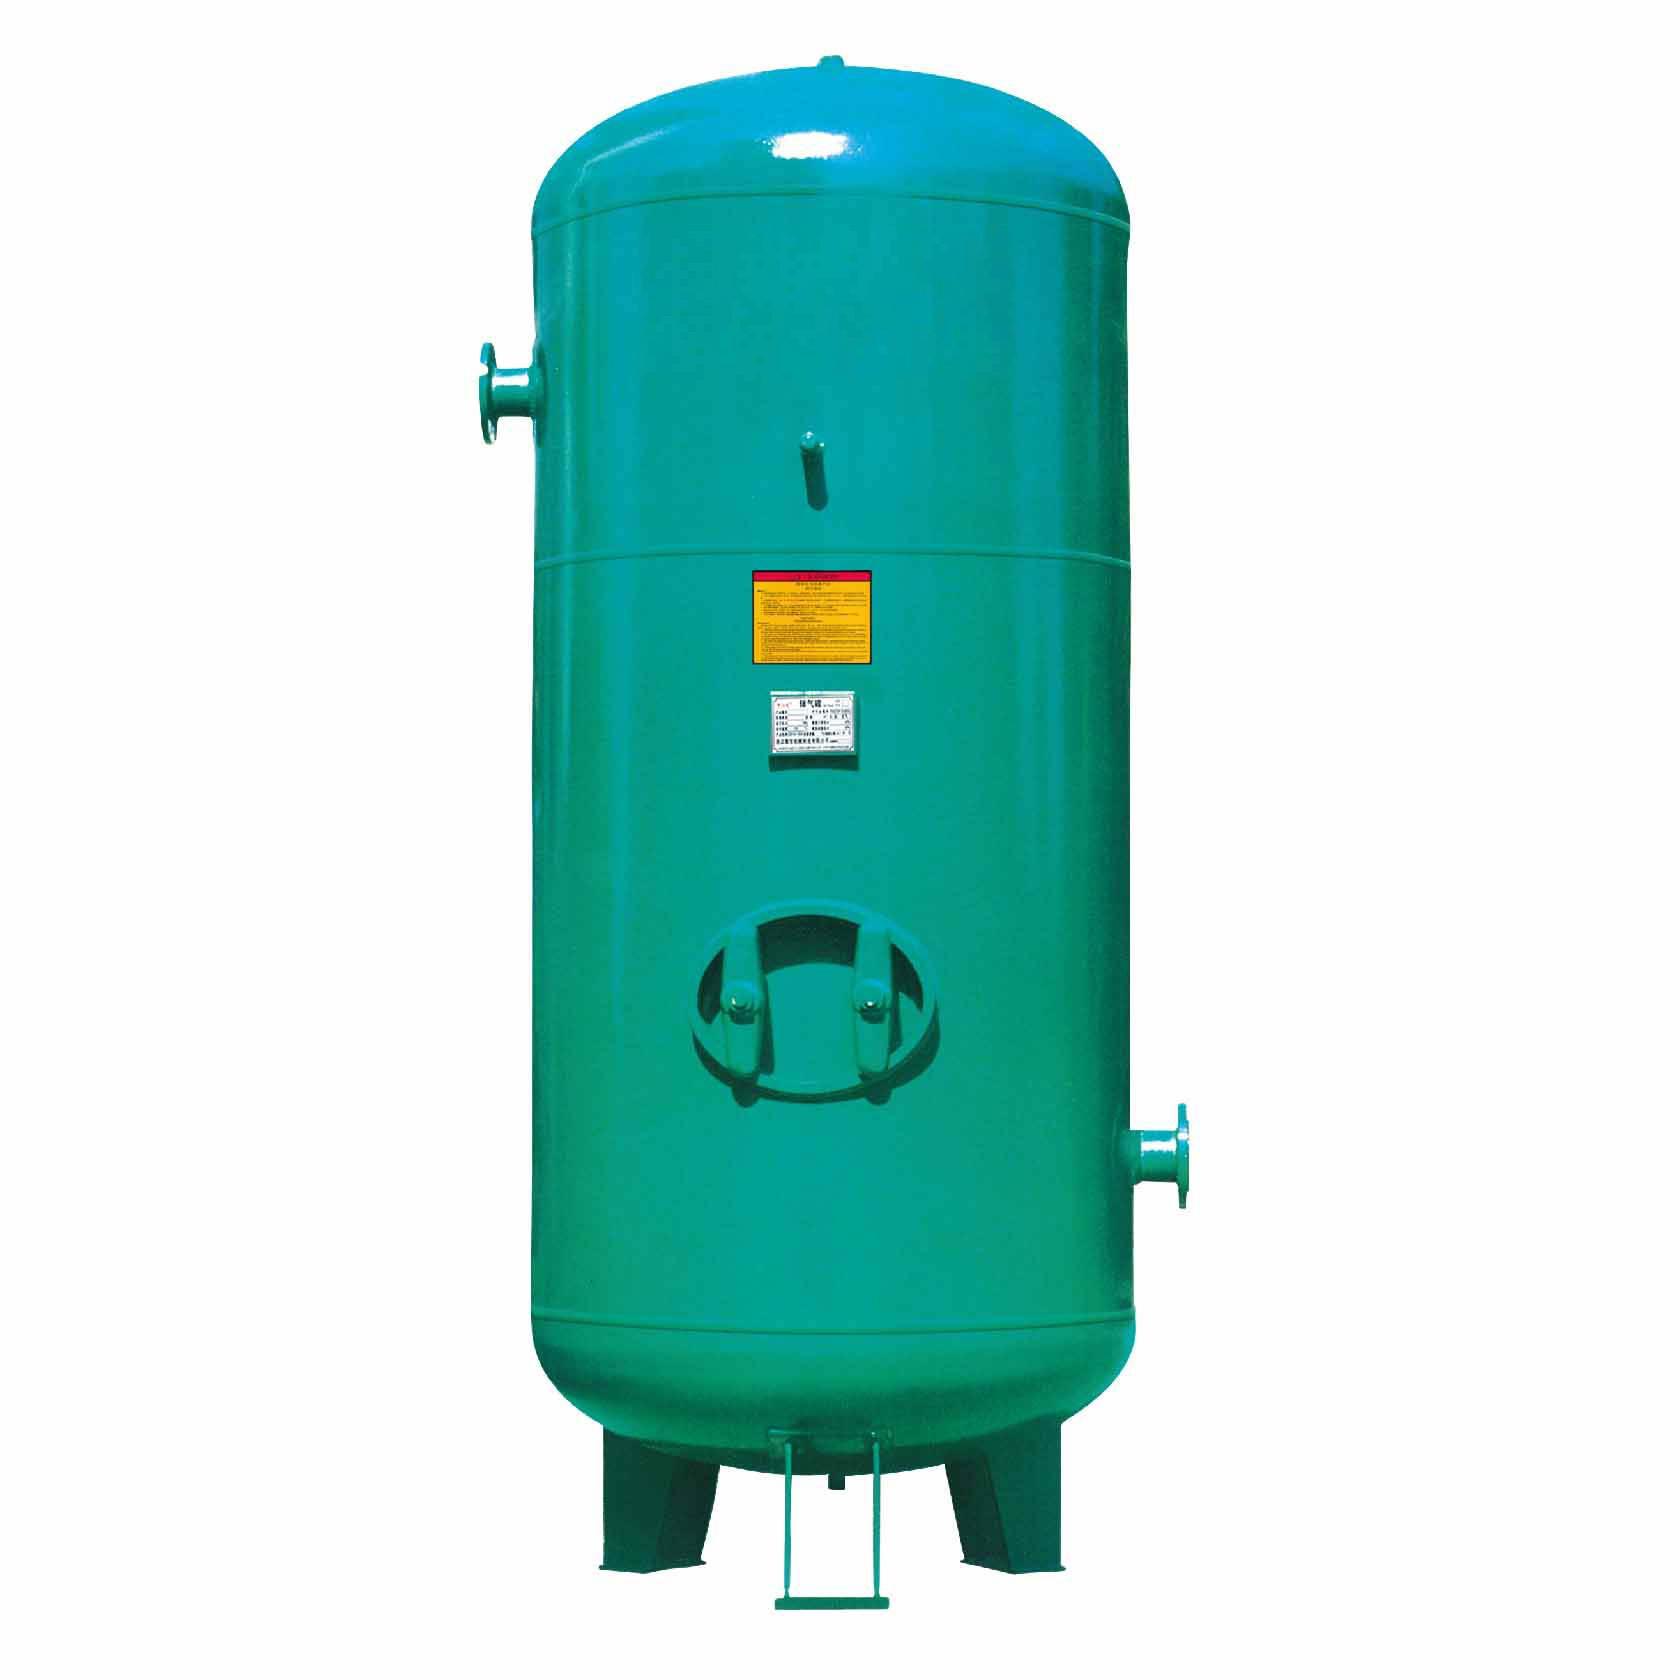 Large air compressor tank